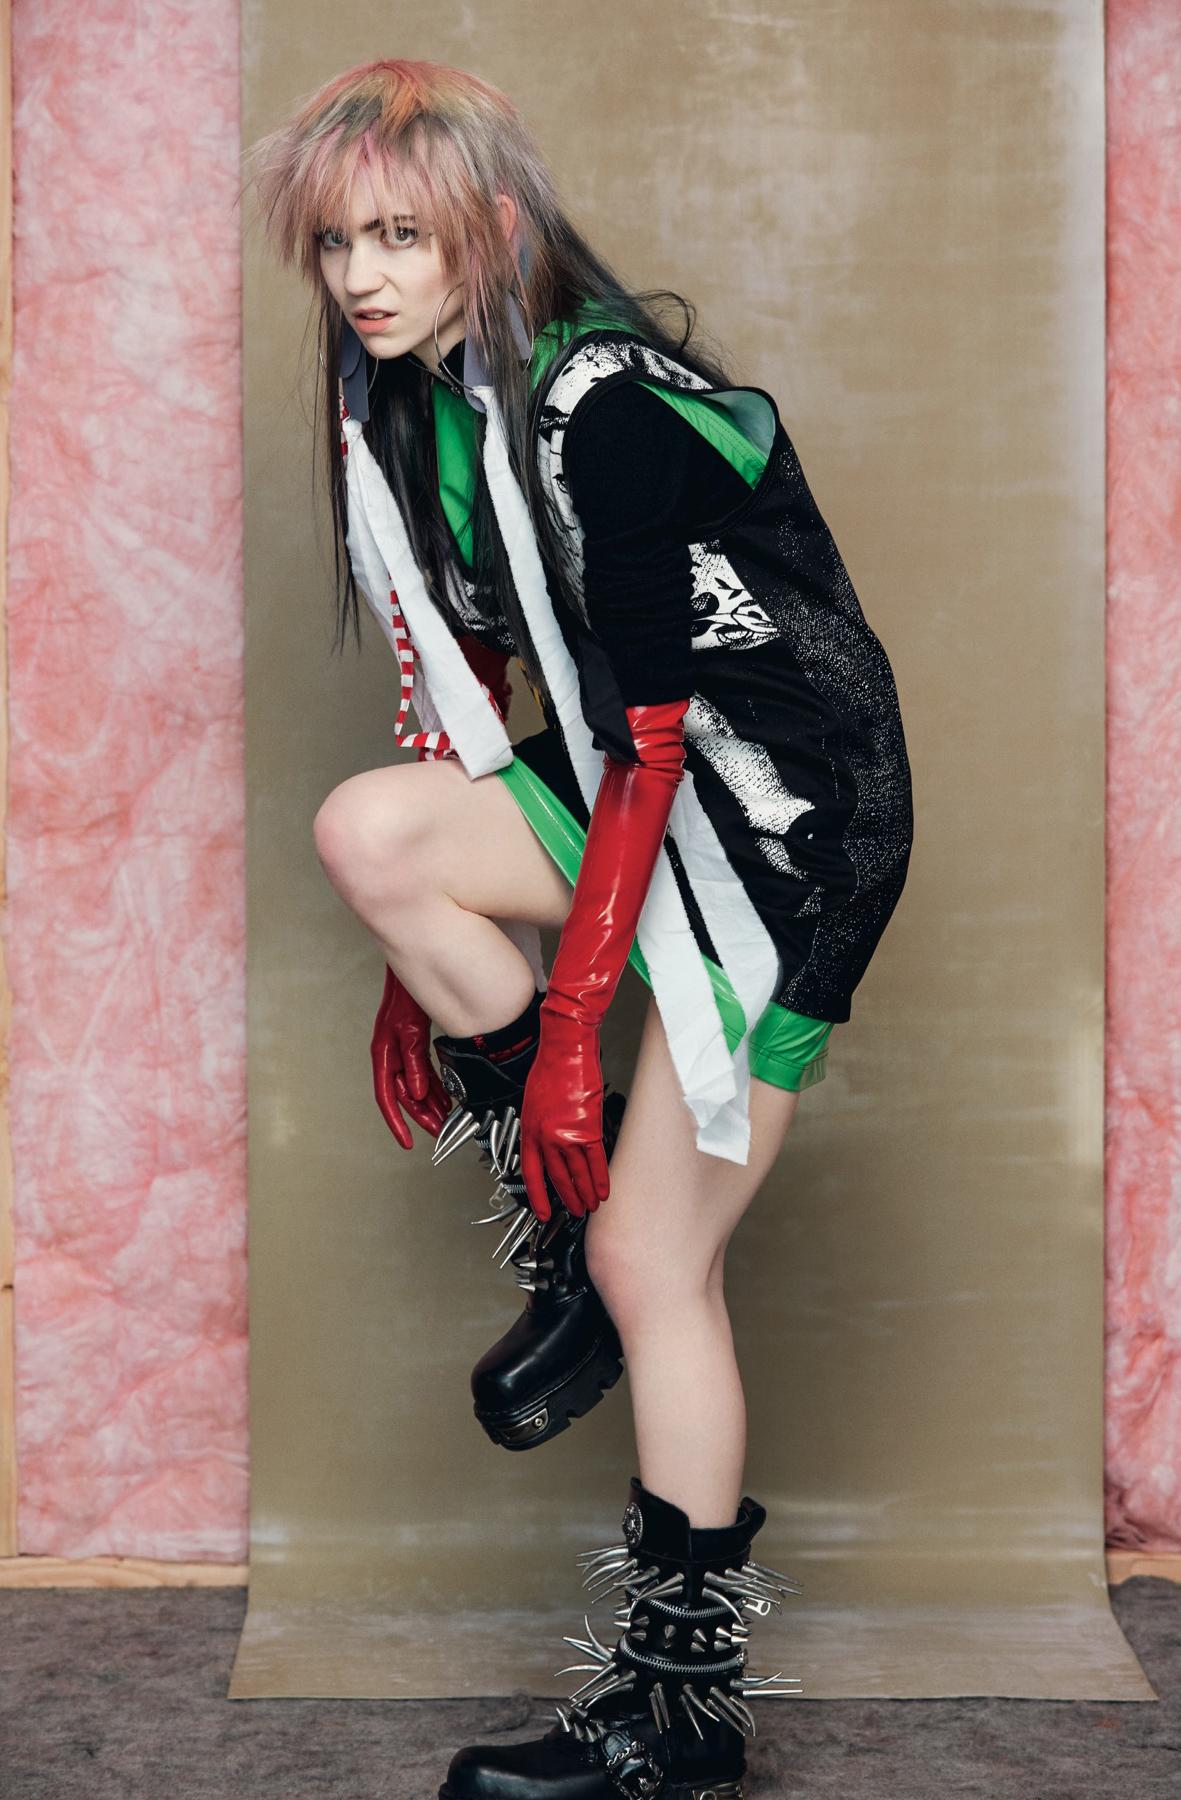 People 1181x1800 Grimes women singer dyed hair legs women indoors